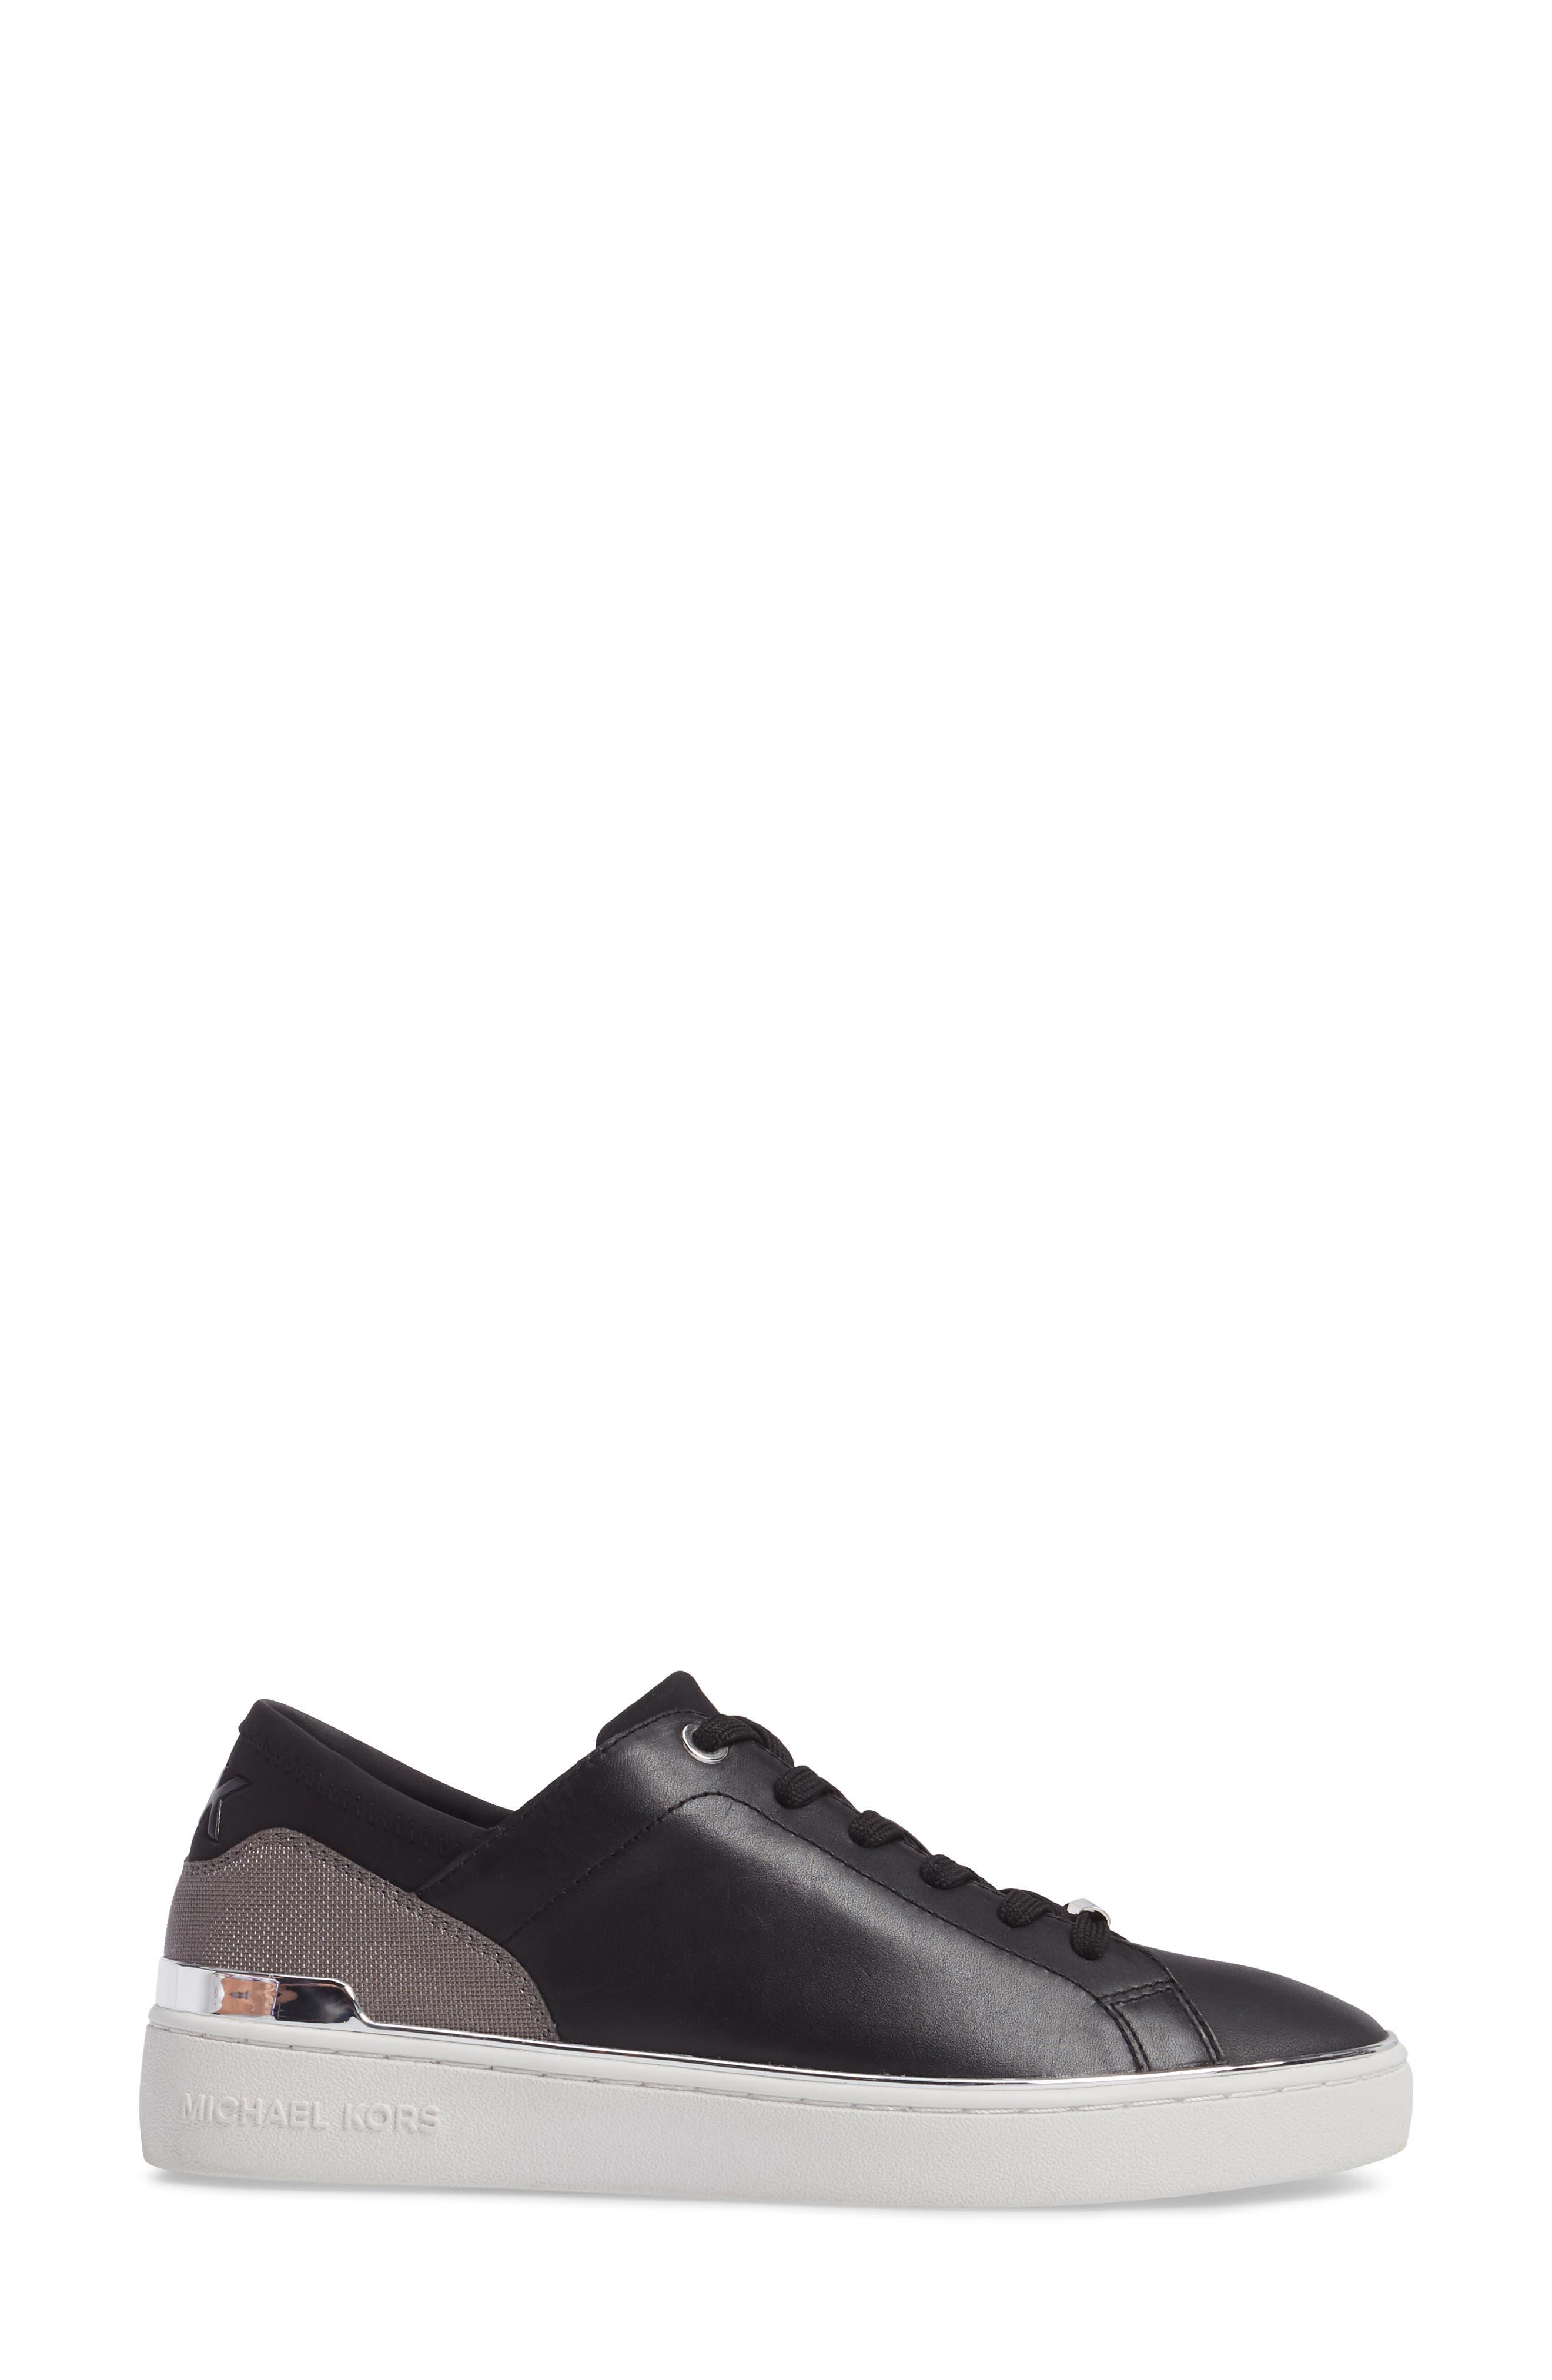 Scout Sneaker,                             Alternate thumbnail 3, color,                             002